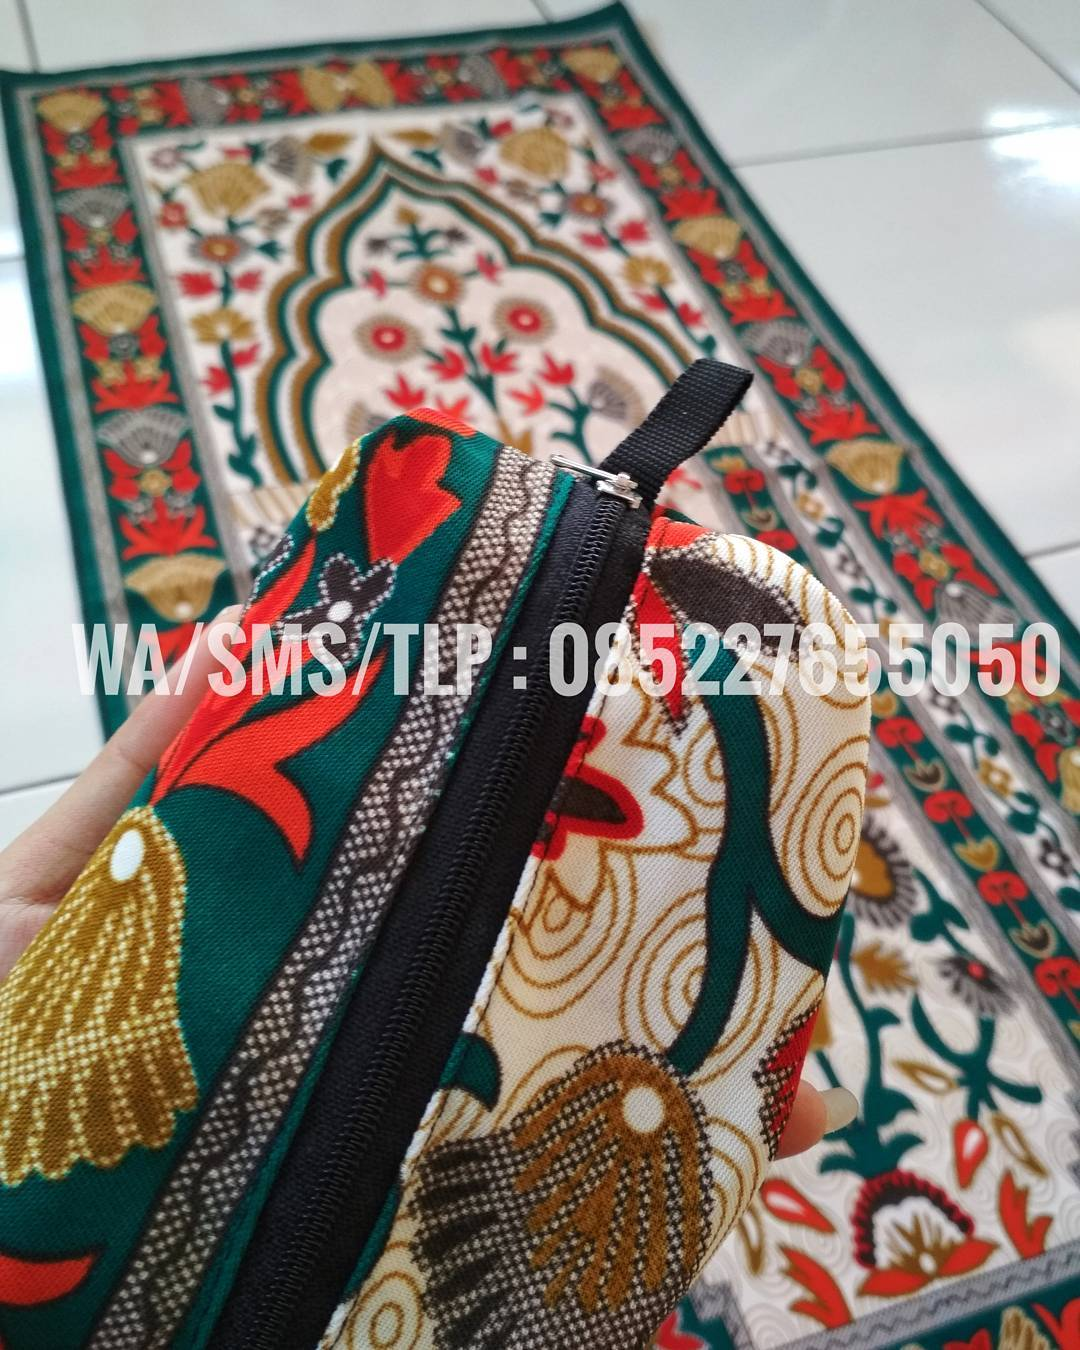 sajadah praktis, sajadah tas WA 0852 2765 5050